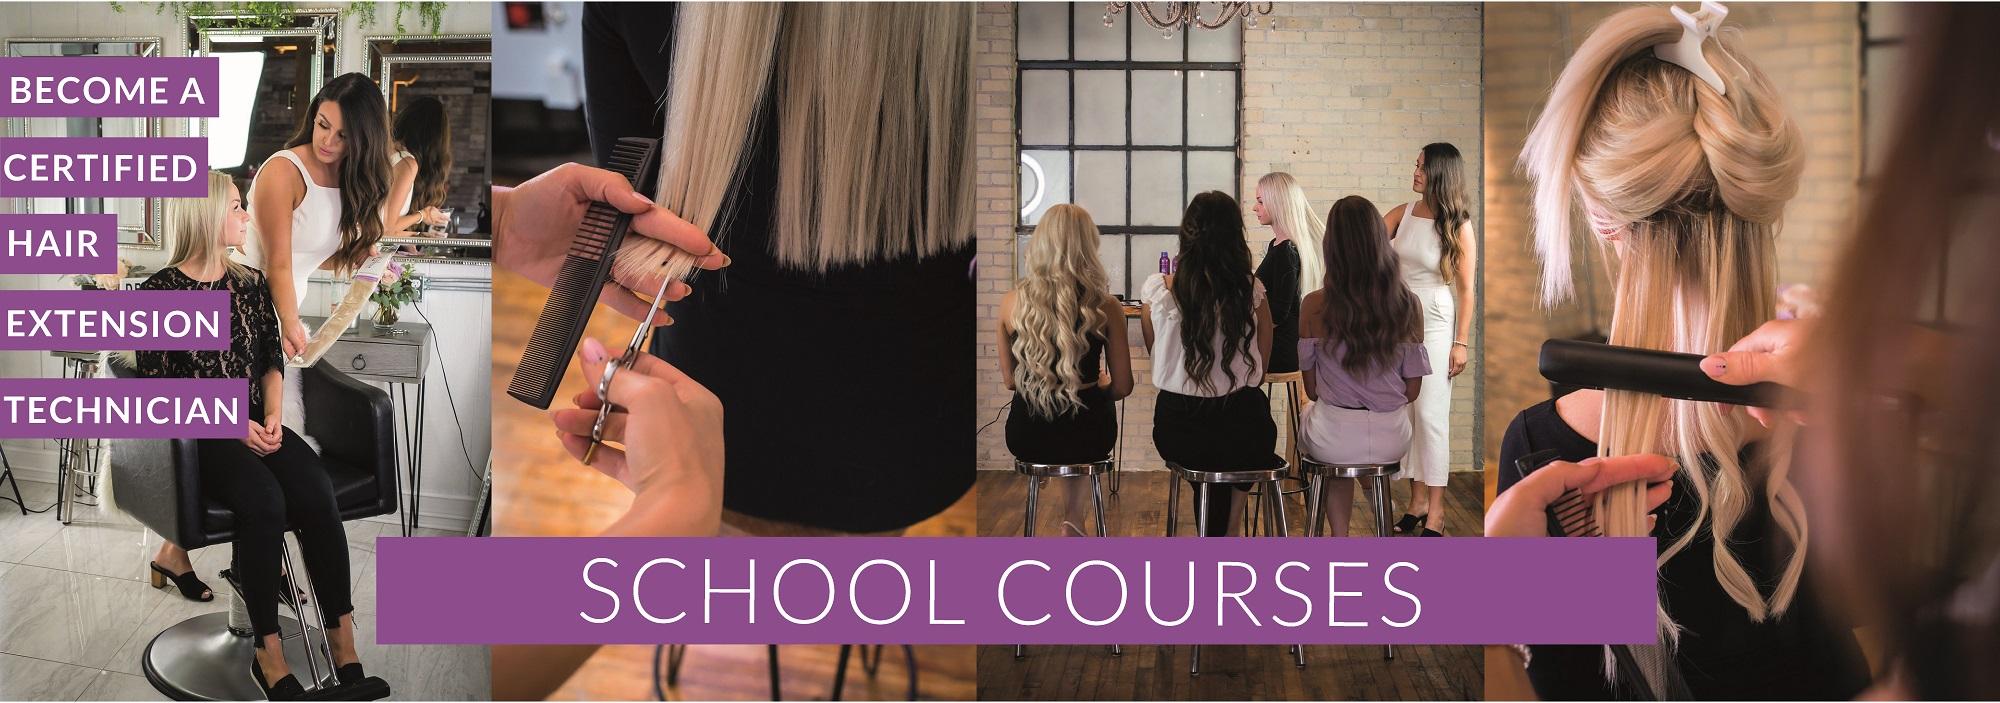 school-hair-extension-courses-sm.jpg